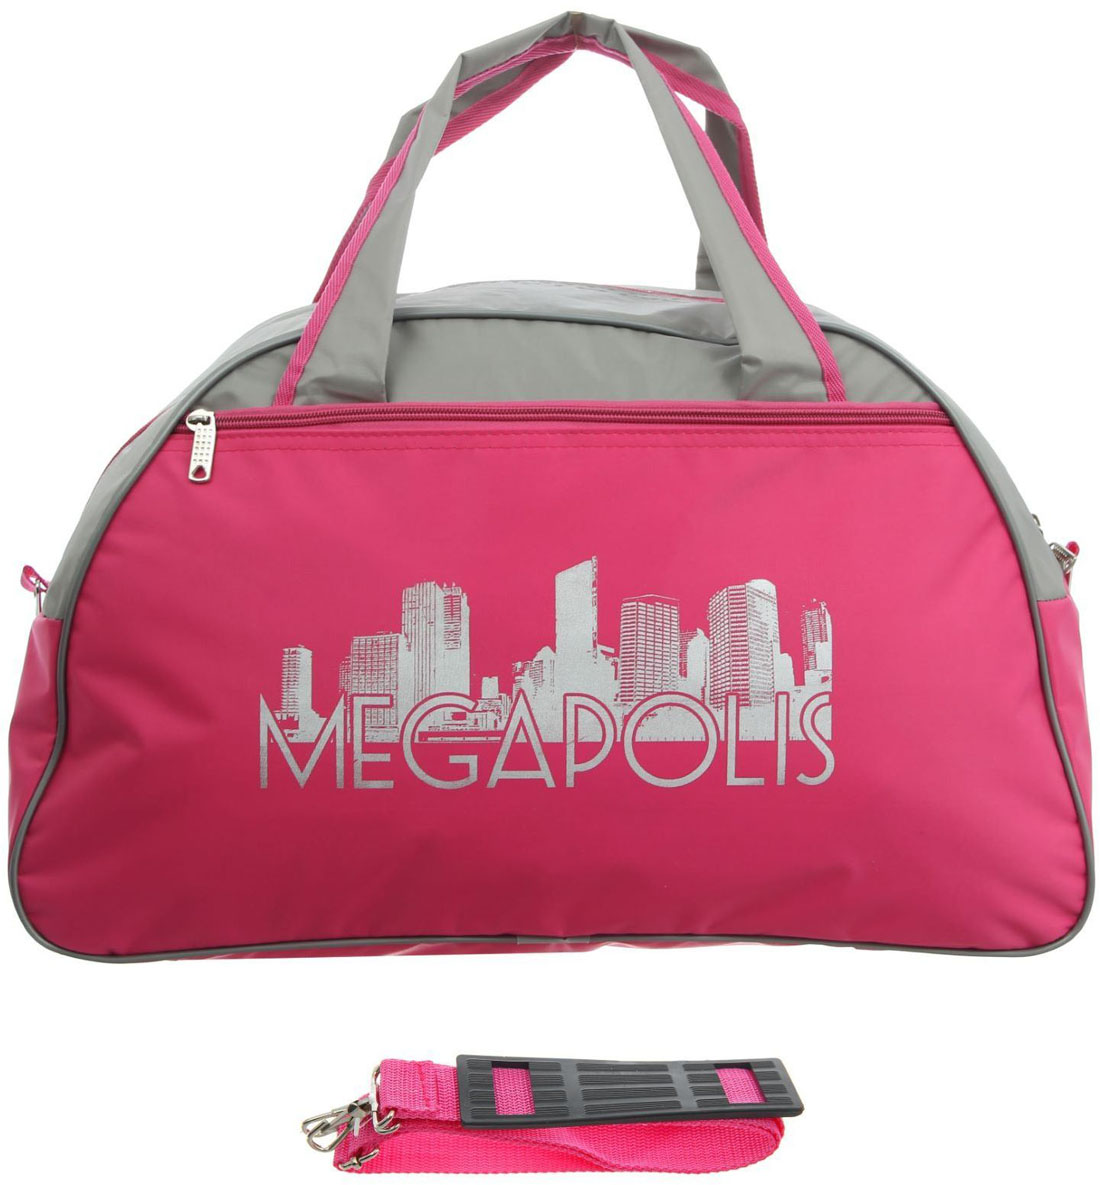 Сумка дорожная ZFTS, цвет: розовый, серый. 745478 сумка дорожная zfts цвет темно синий 189084